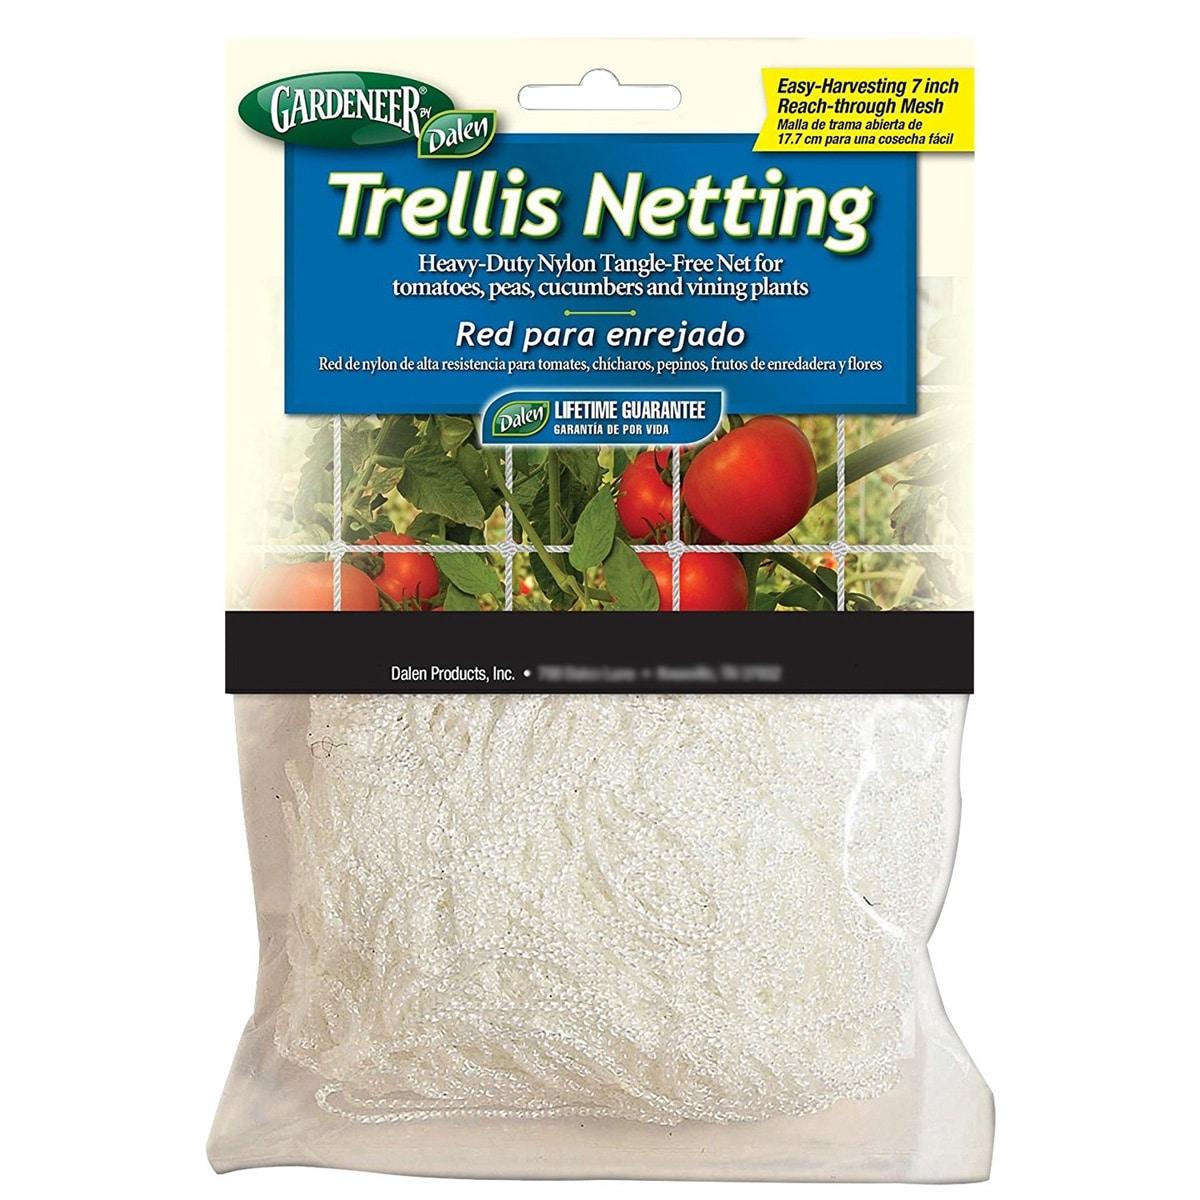 Gardeneer TP-60 5-foot X 60-foot Trellis Netting (Plant S...